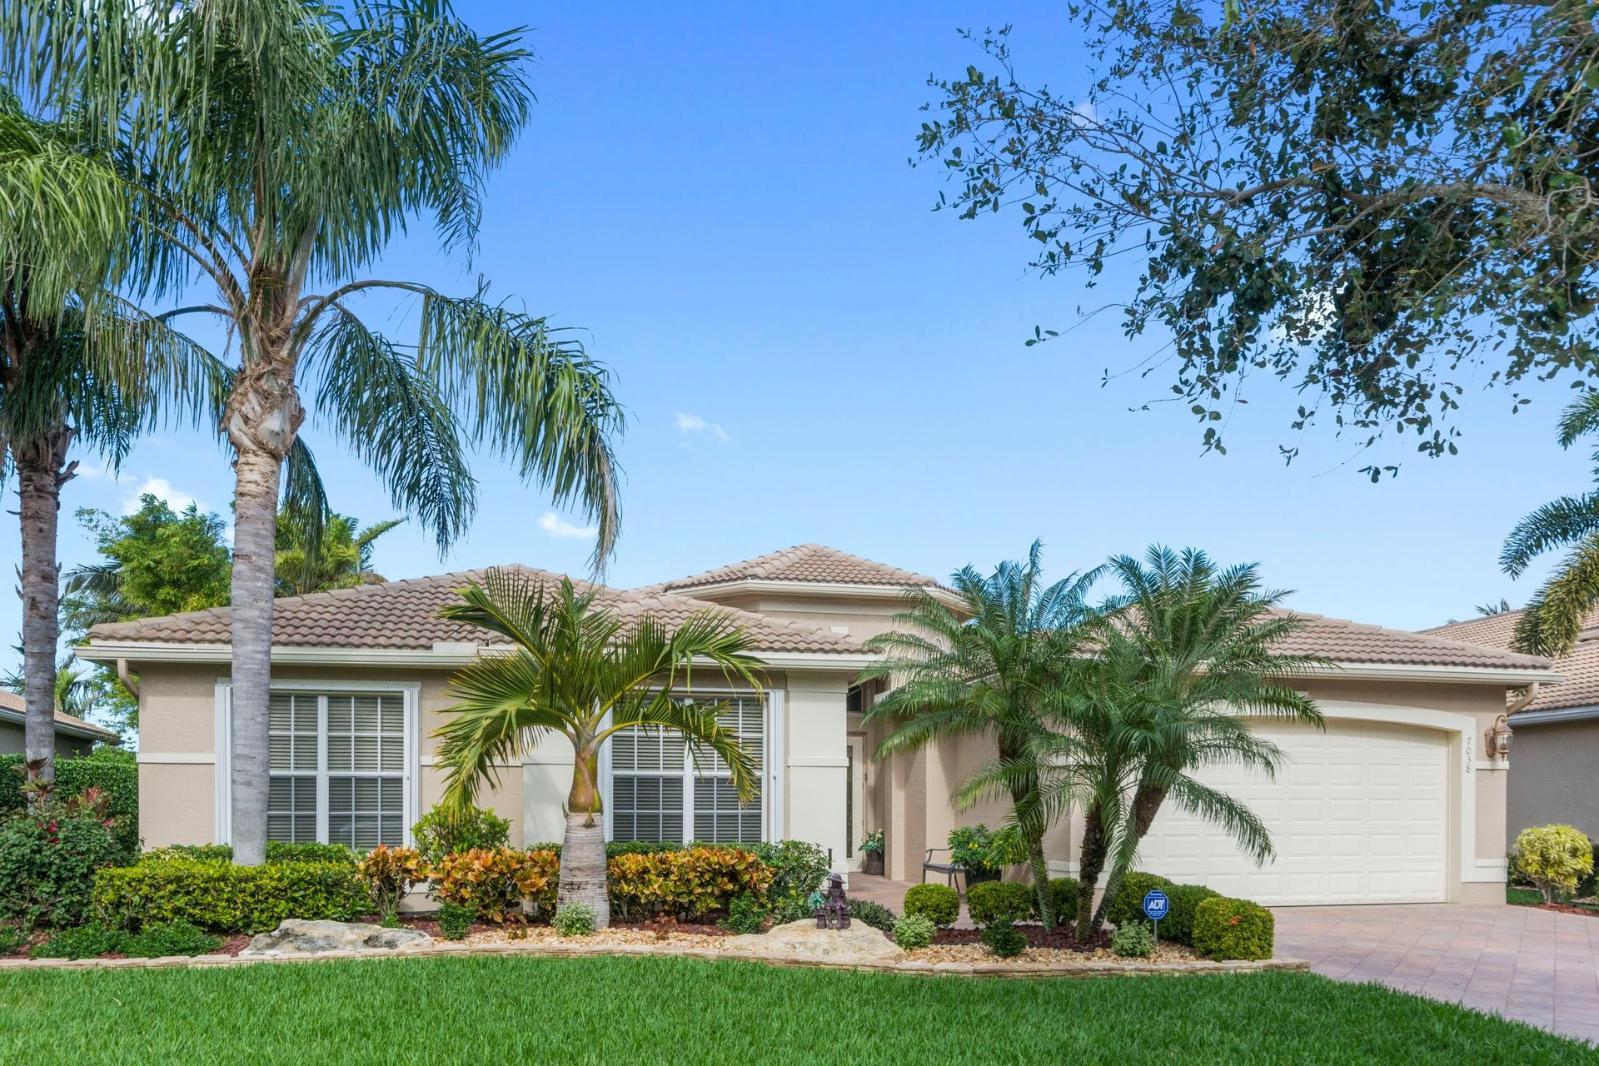 Homes For Sale In Valencia Pointe Boynton Beach Fl